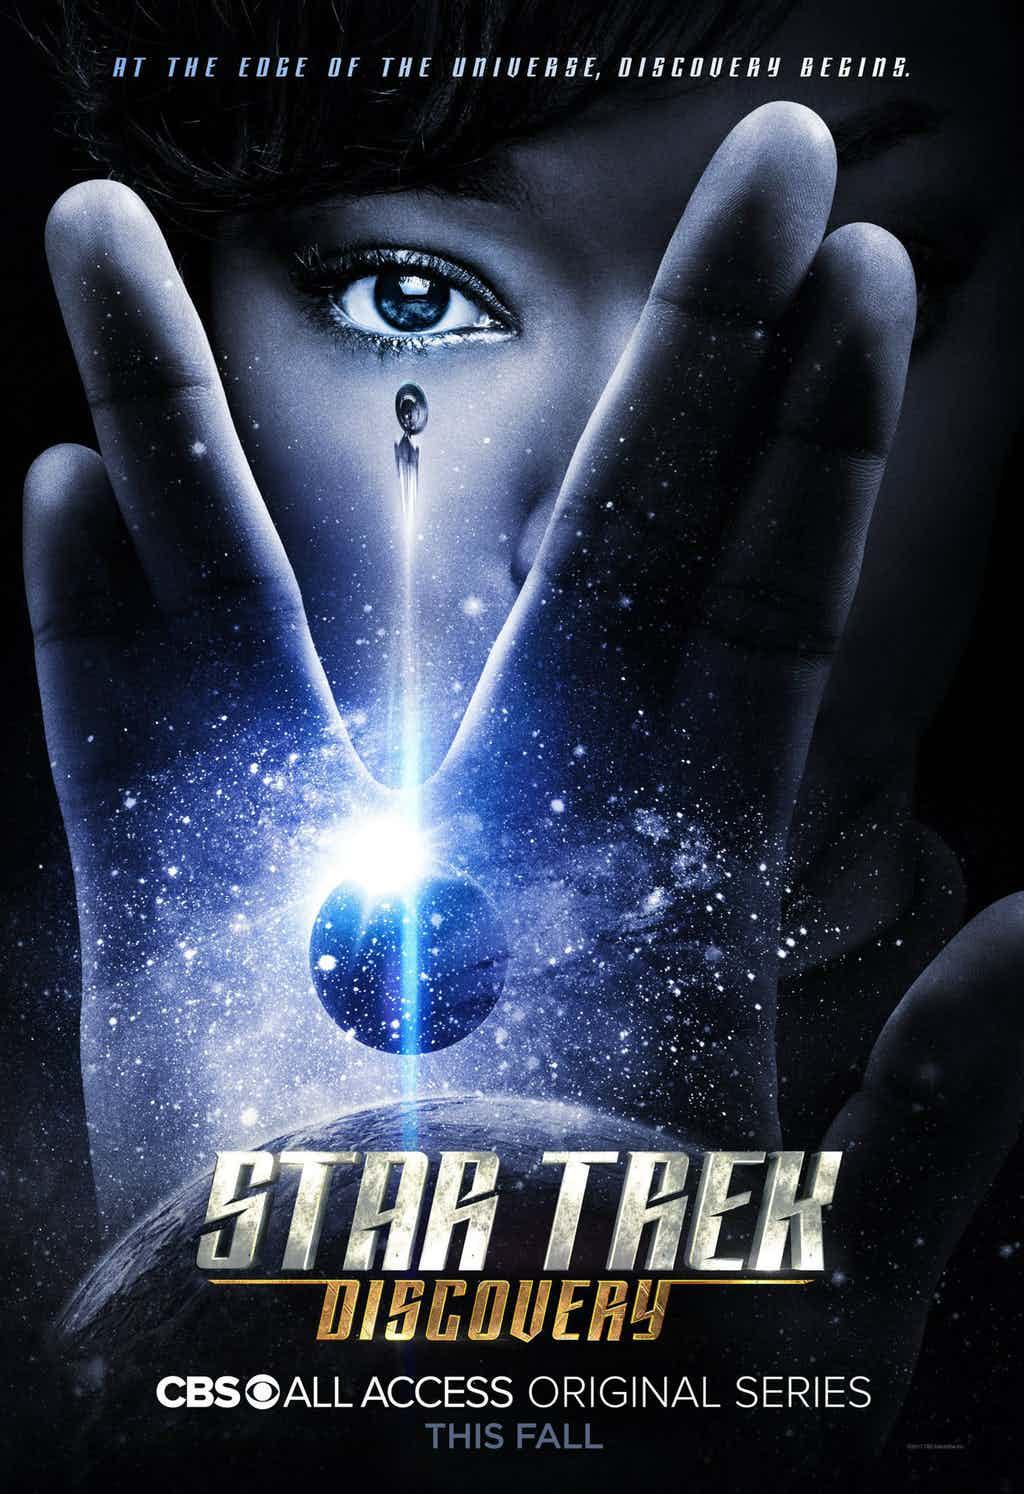 'Star Trek: Discovery' ya tiene fecha de estreno en Netflix